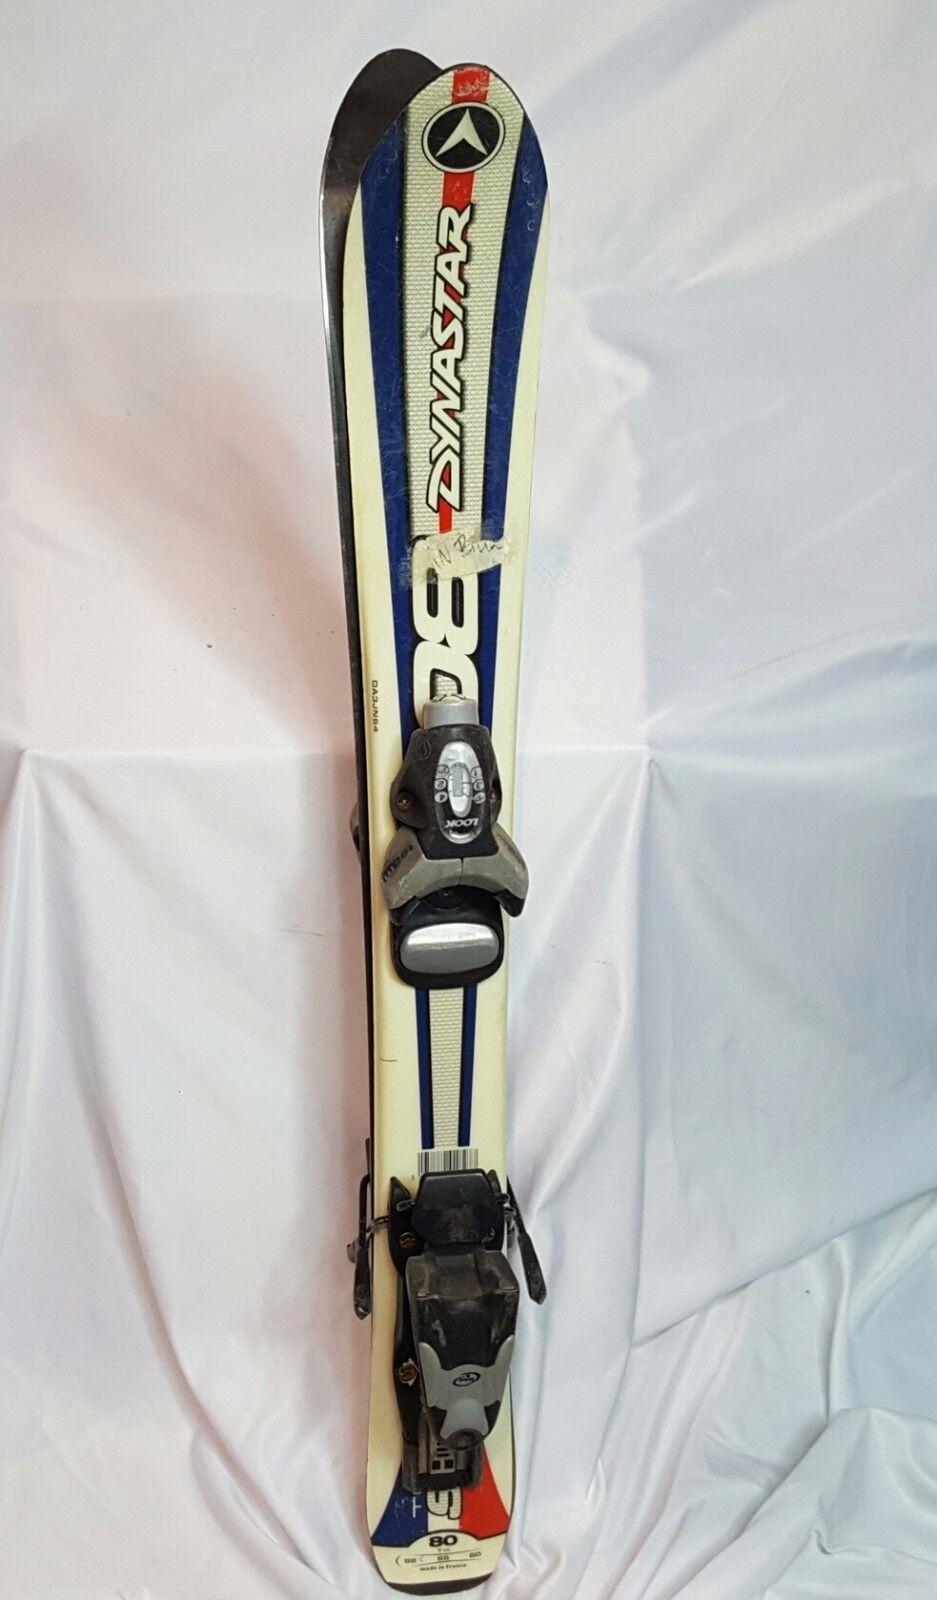 KIDS SKI Dynastar JR 80cm ski, USED LOOK ski bindings adjust to fit boots